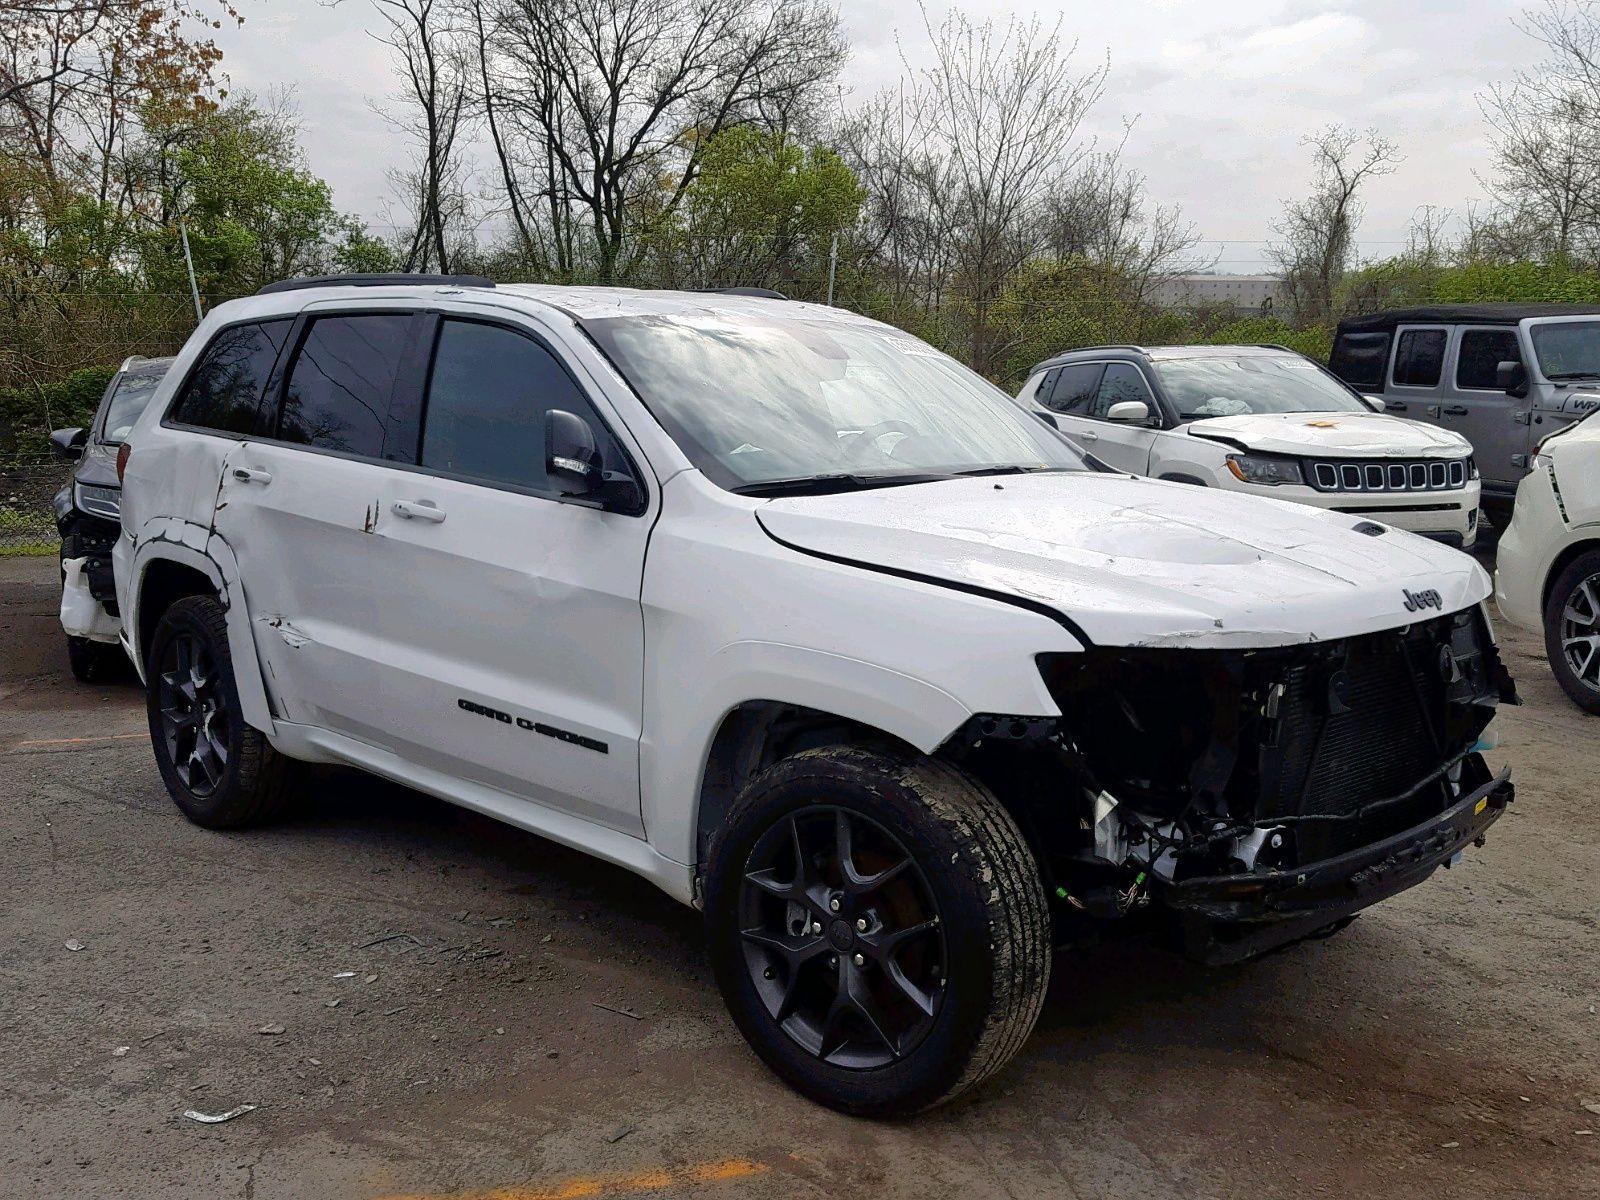 Pin By Dwayne Harry On Hussle Rebuild Motors Jeep Cherokee Limited Jeep Jeep Grand Cherokee